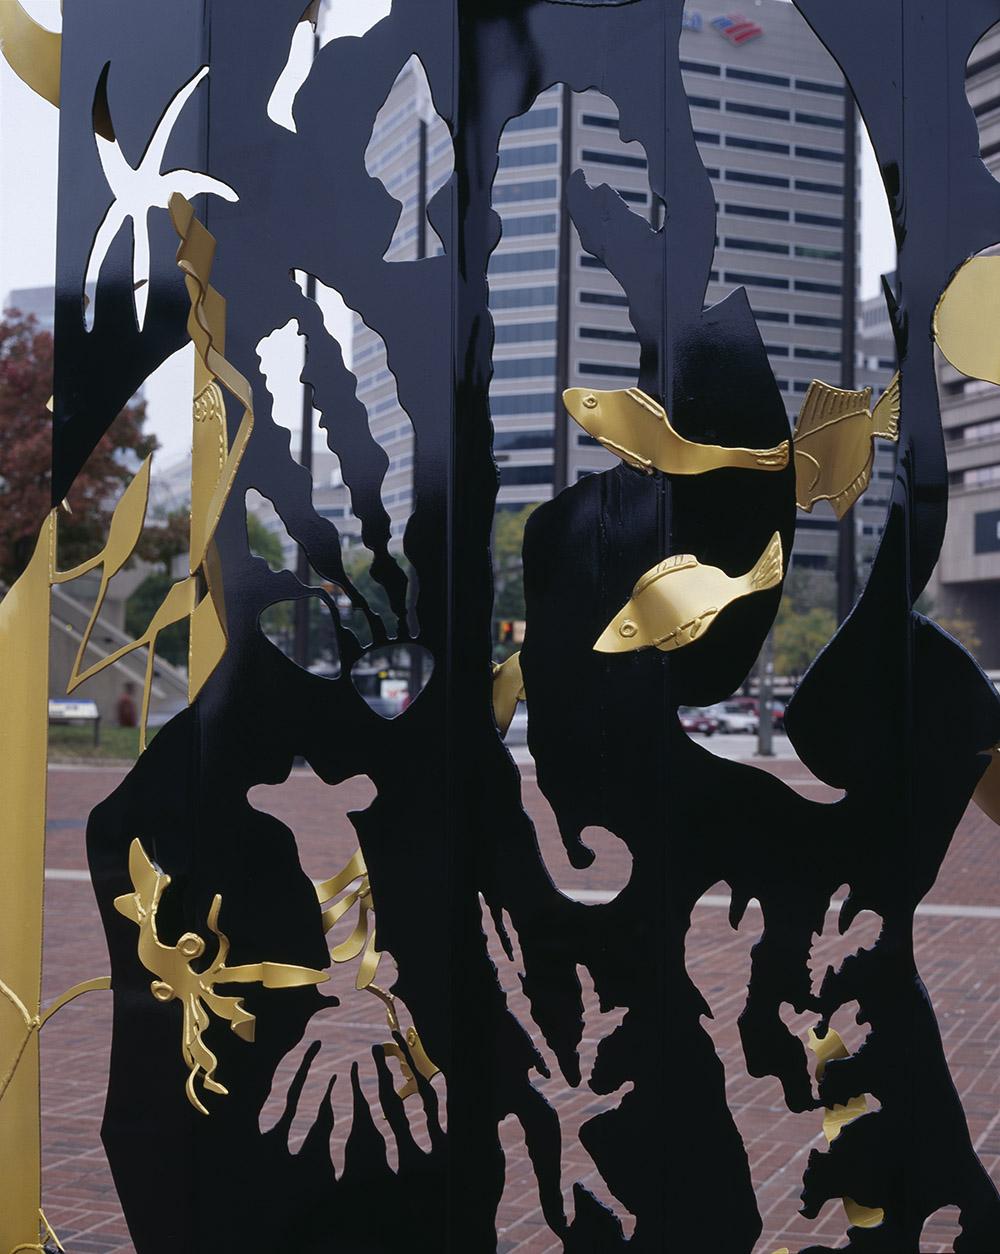 4.f-Ono-Dreams-2006.-Painted-mild-steel-2-sculptures-374.9-x-253-x-204.2-cm-and-500-x-274.3-x-243.8-cm-x.jpg